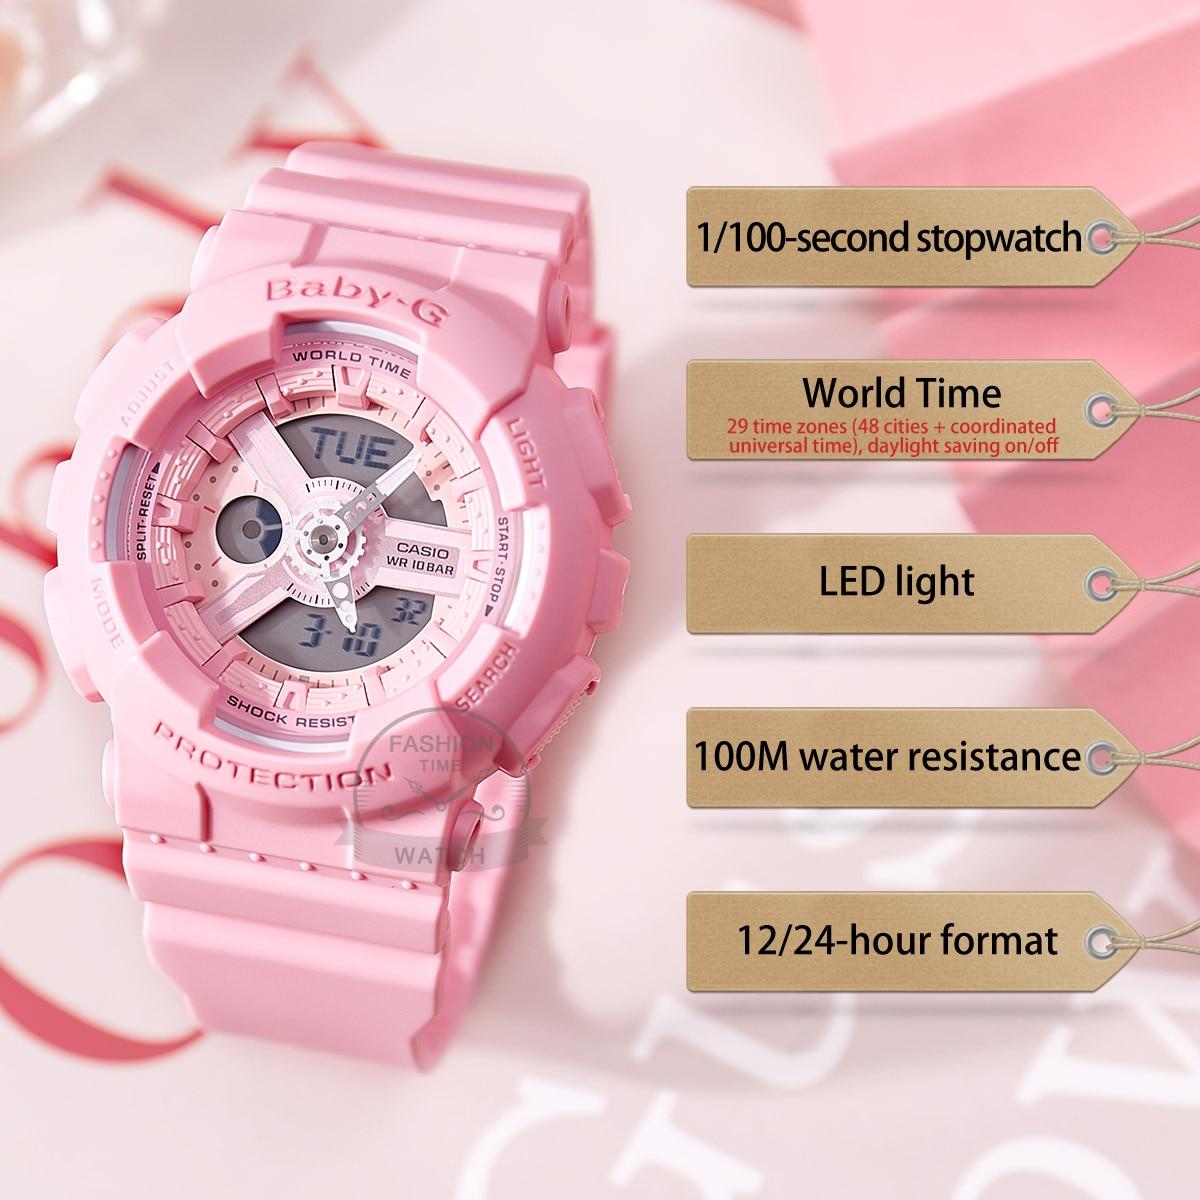 Casio watch men g shock top luxury set military Chronograph LED digital watch sport quartz men watch часы мужские BA-110-4A1 enlarge